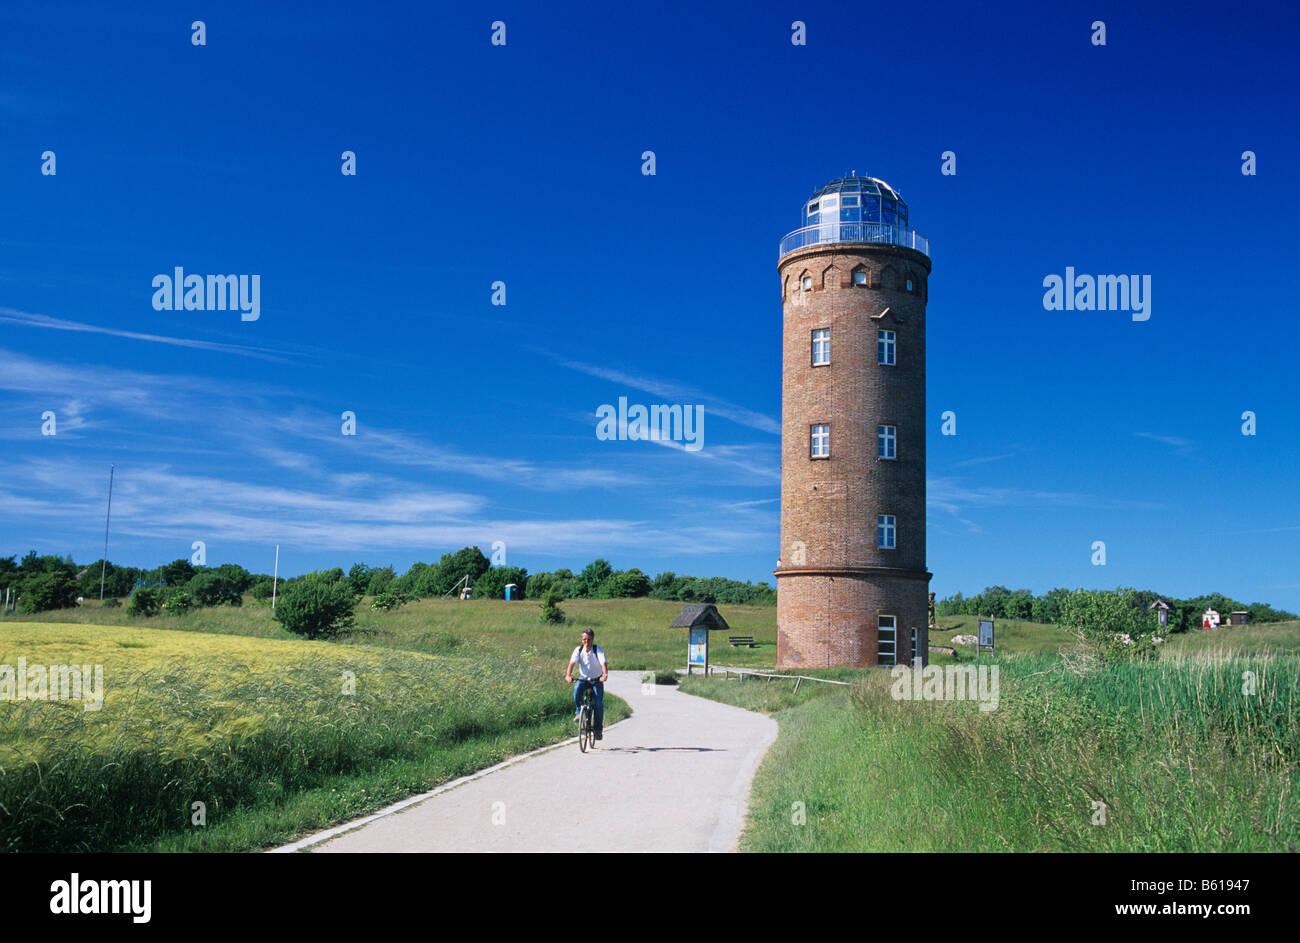 Peilturm Tower on the slavic fortress wall, exhibition building, Kap Arkona, Wittow Peninsula, Ruegen Stock Photo